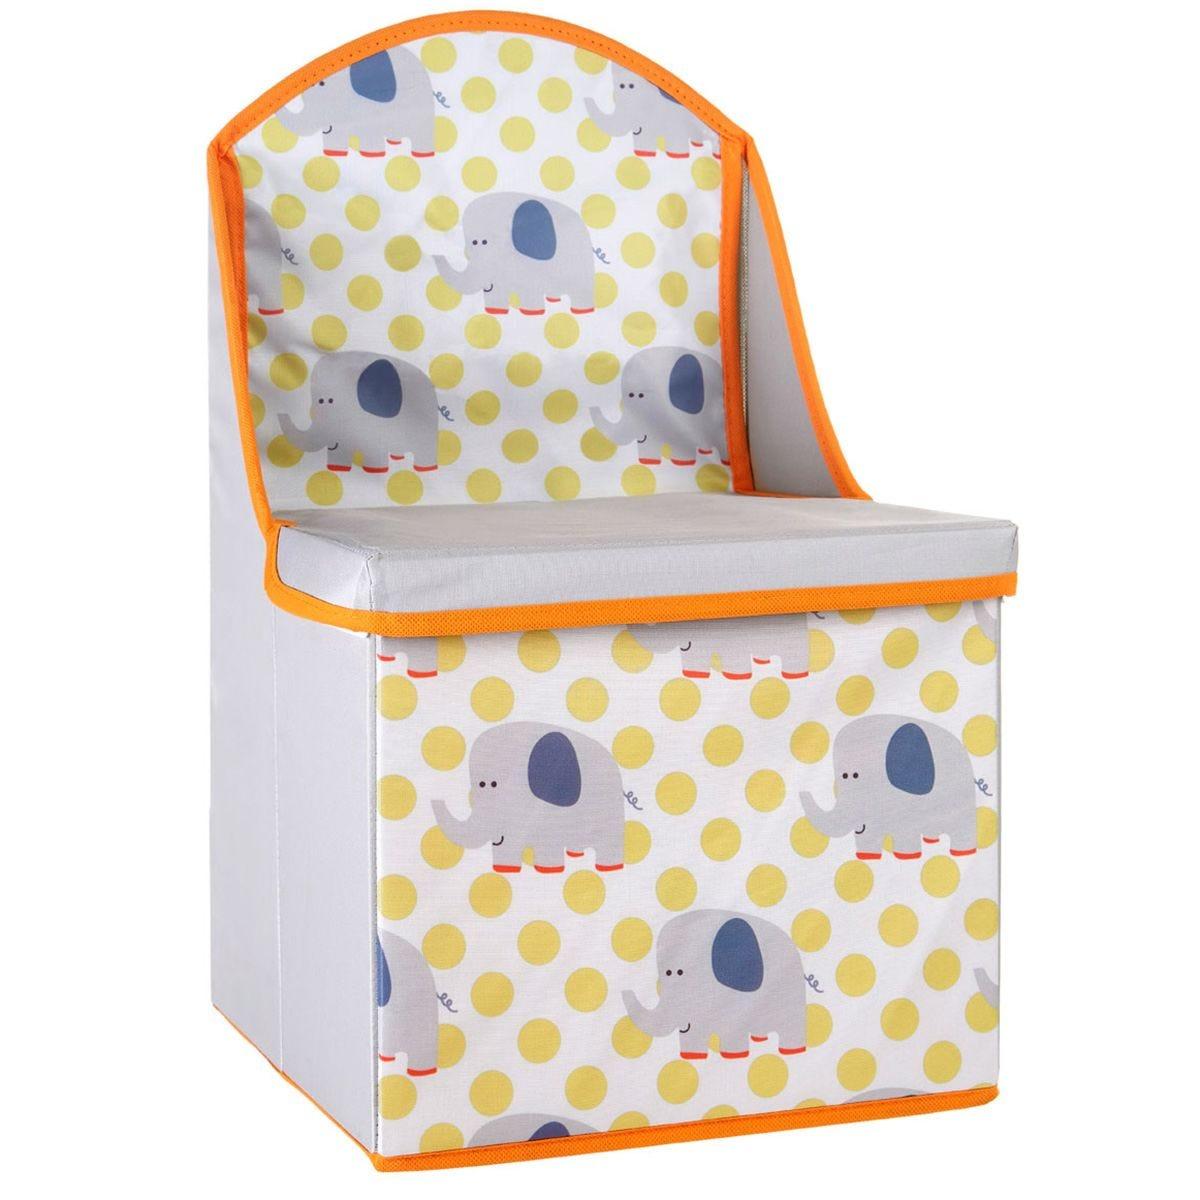 Storage Box / Seat Elephant Design Kids